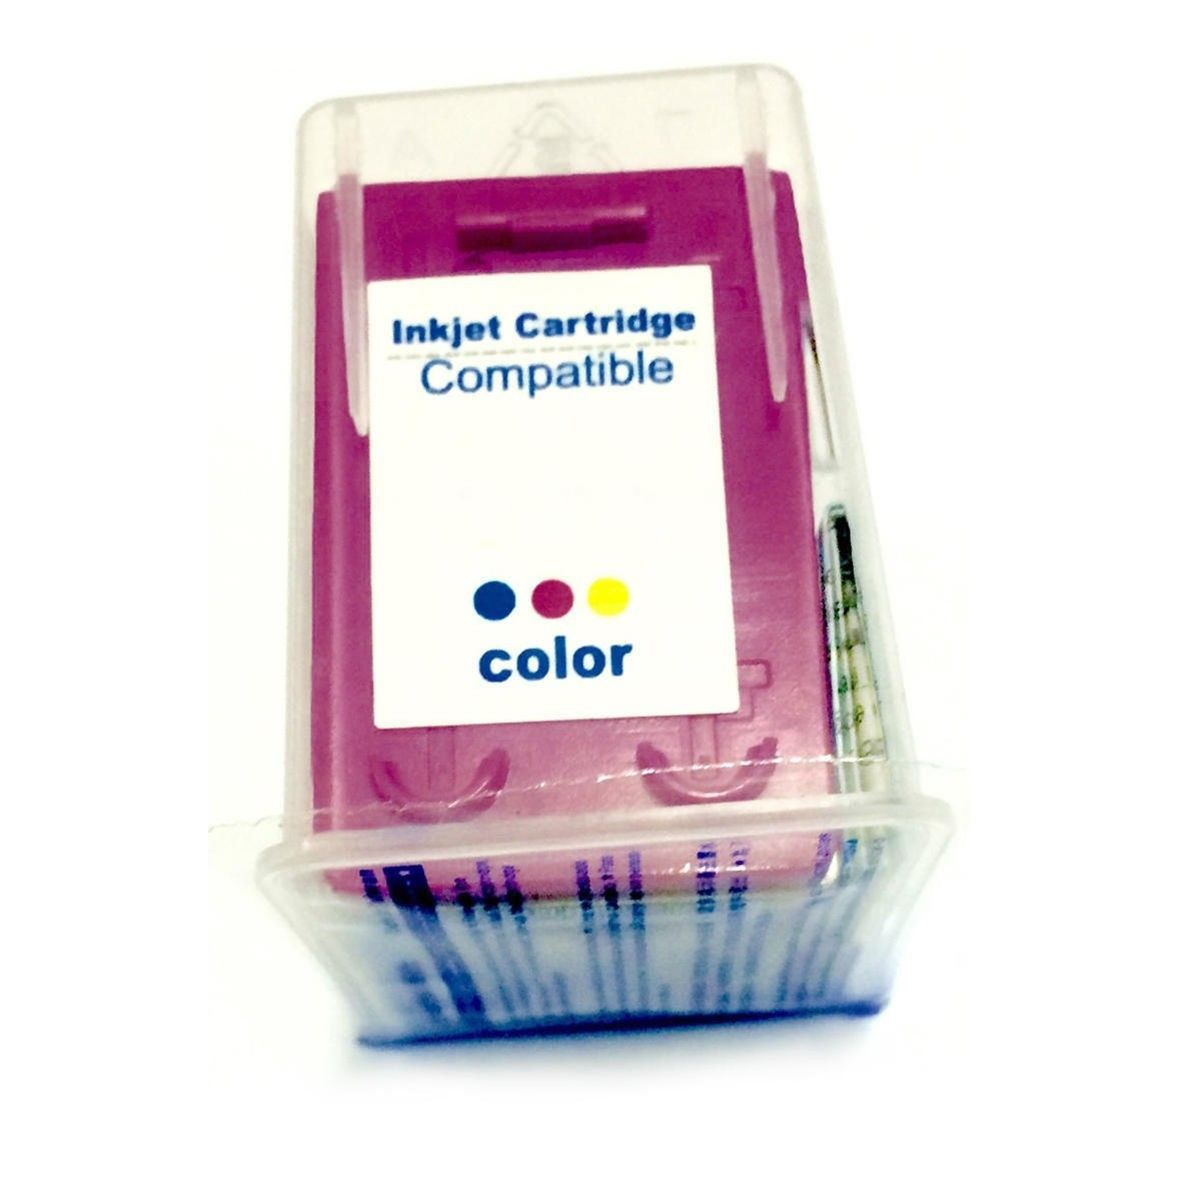 Compatível: Cartucho de Tinta 901 para HP J4540 J4550 J4580 J4680 J4660 J4500 J-4540 J-4550 4580 / Colorido / 13ml